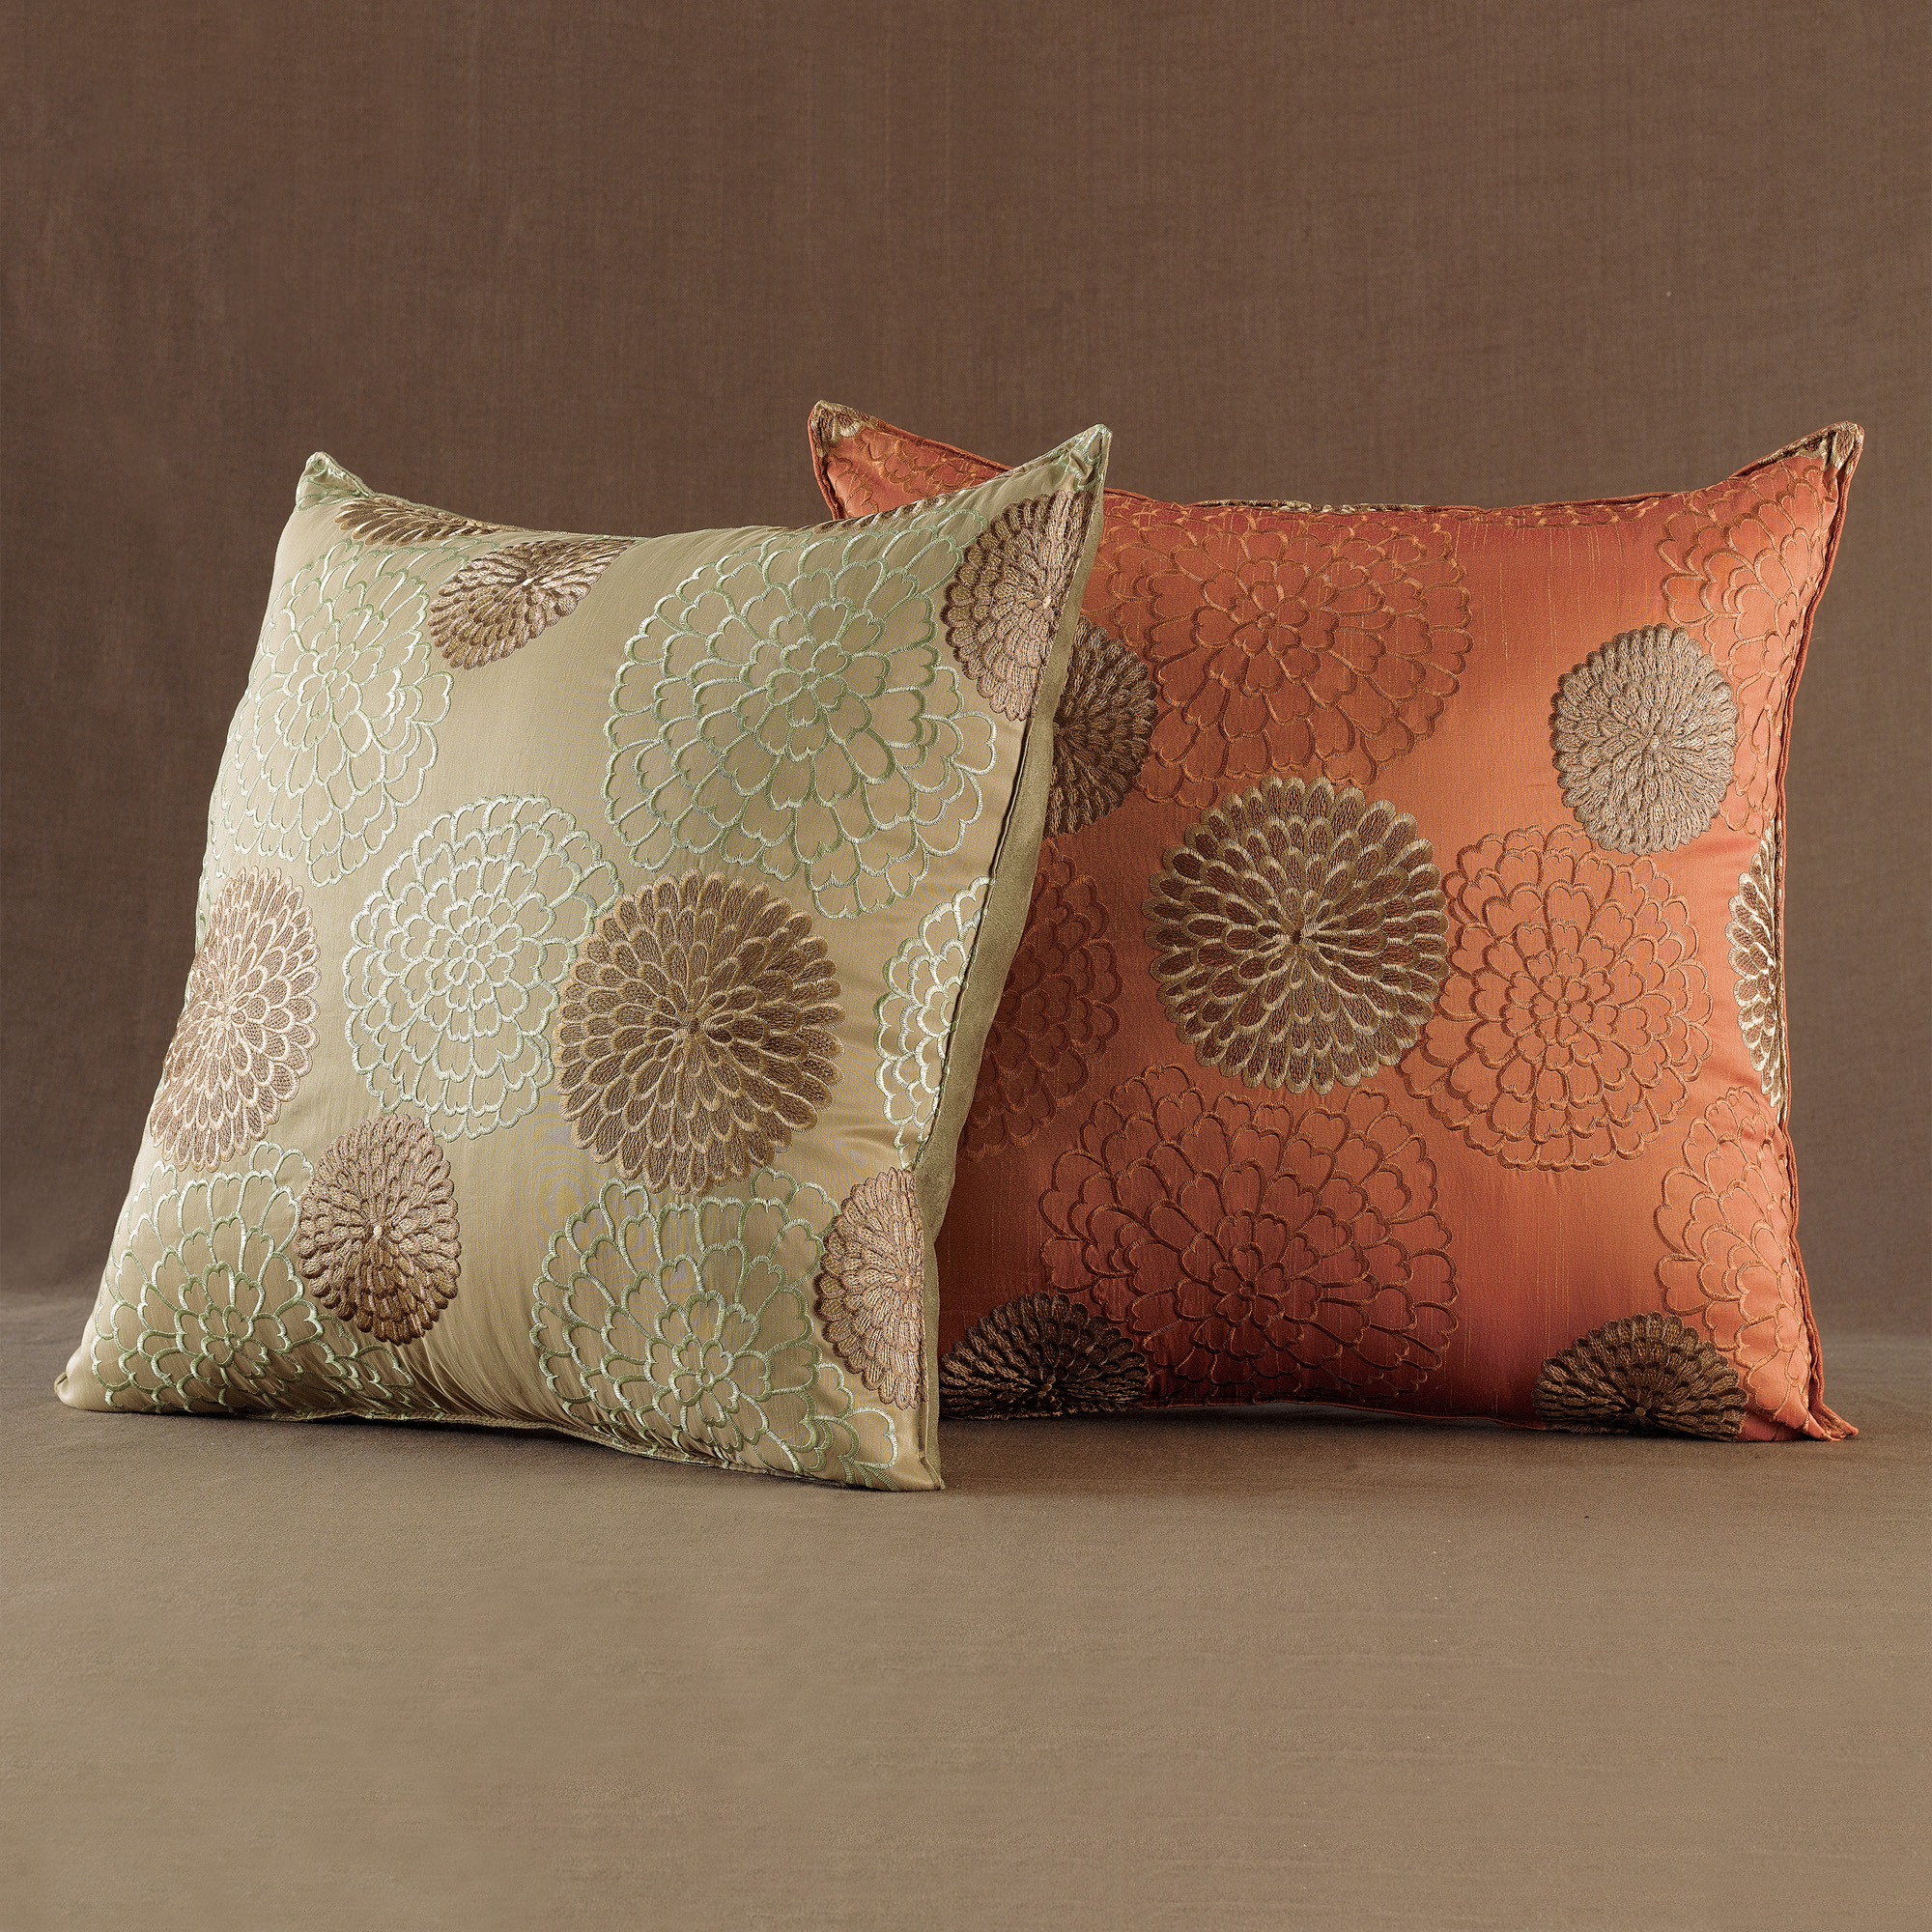 Throw Pillows Home : Chrysanthemum Square Pillows Gump s